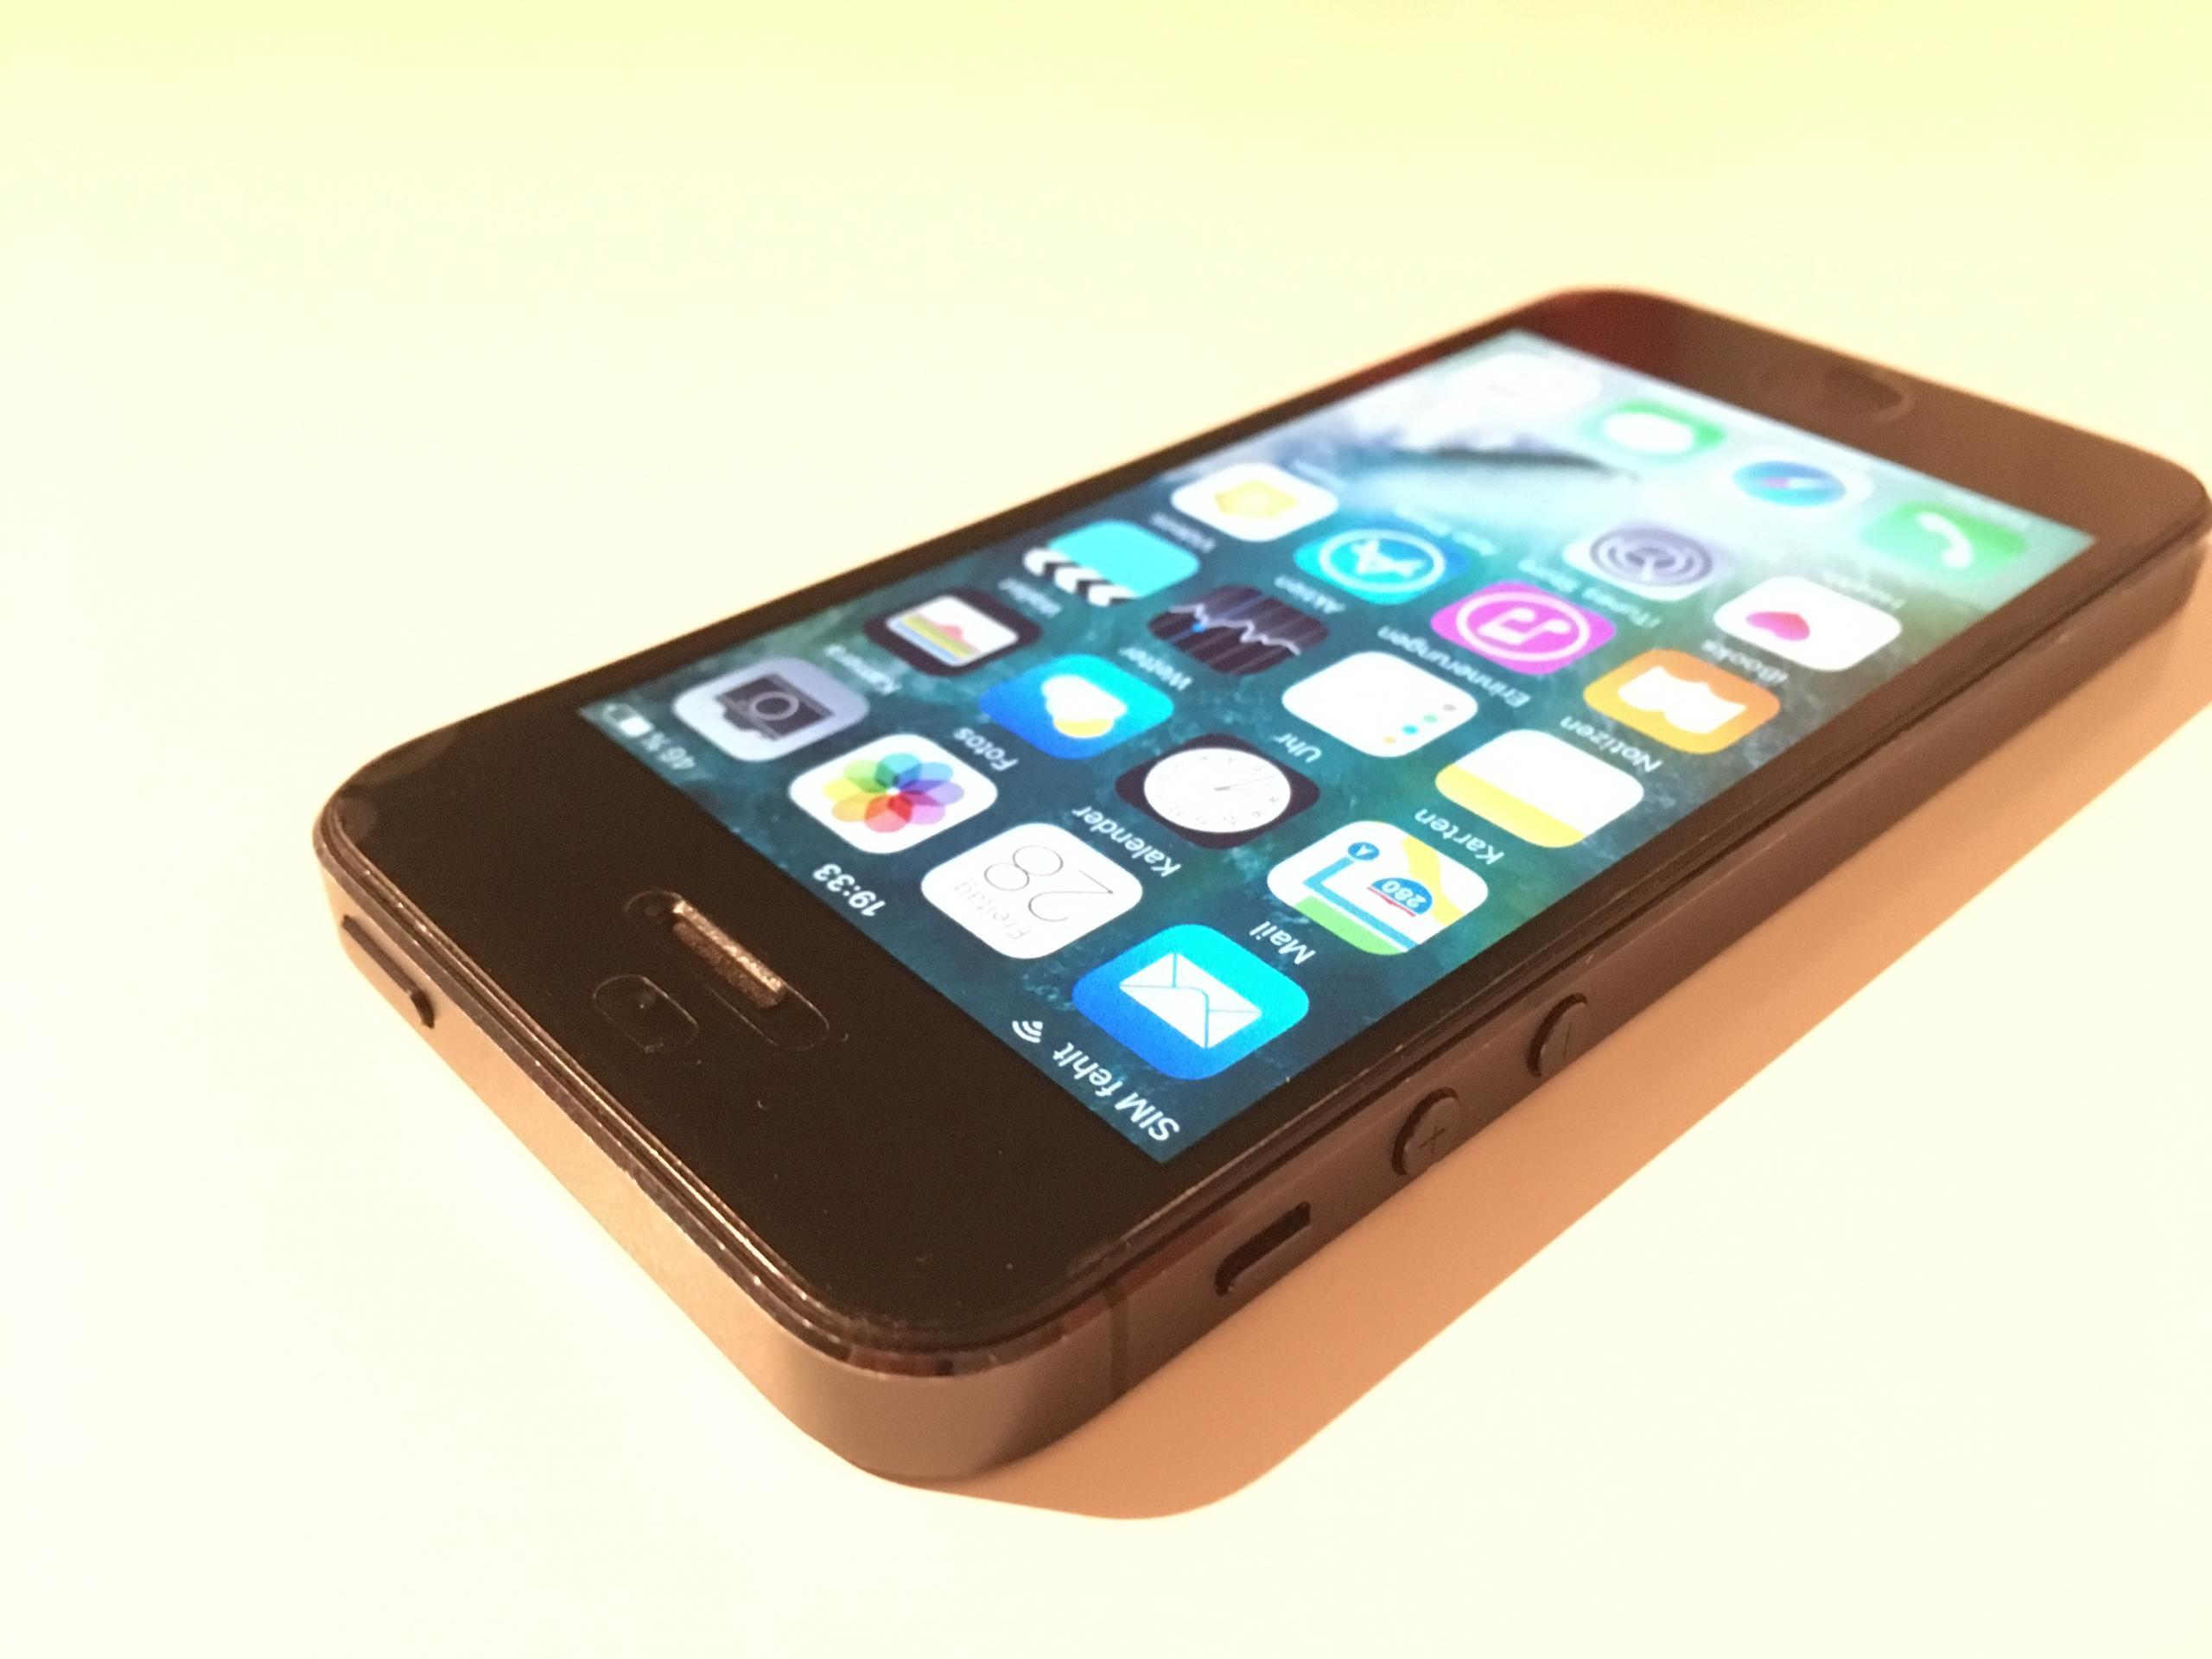 iphone 5 neuer akku